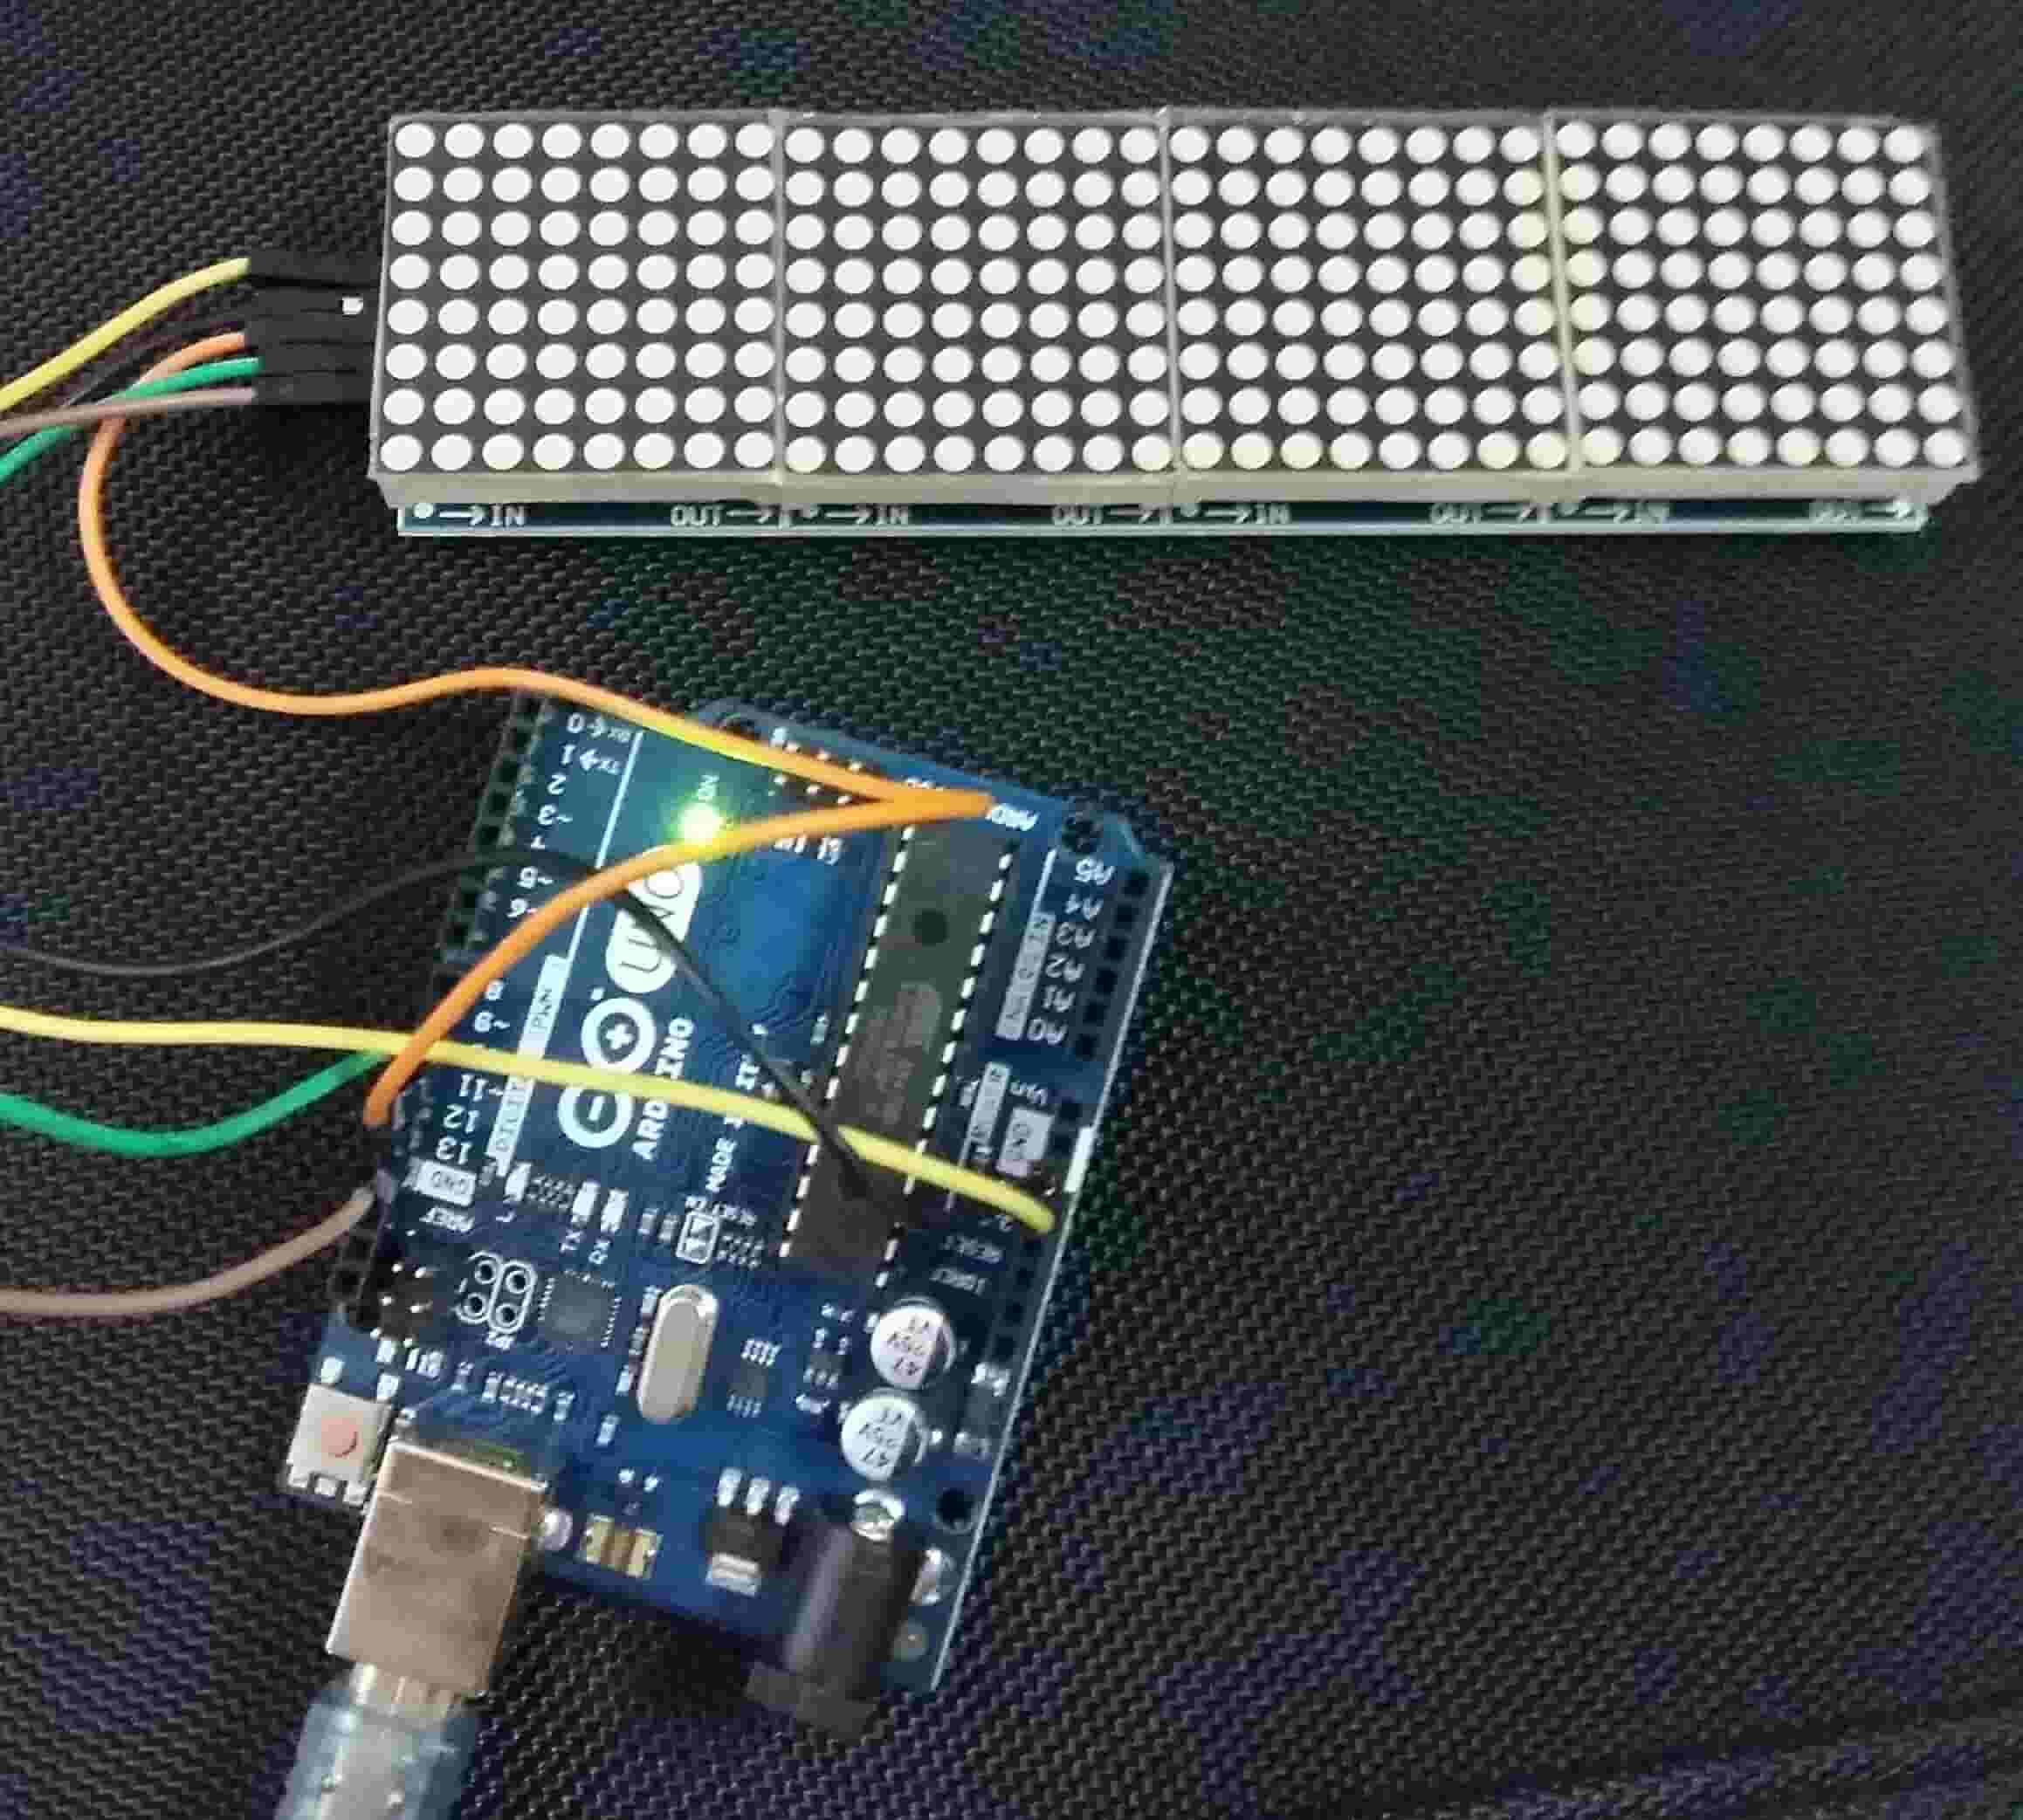 MAX7219 LED dot matrix display module with Arduino